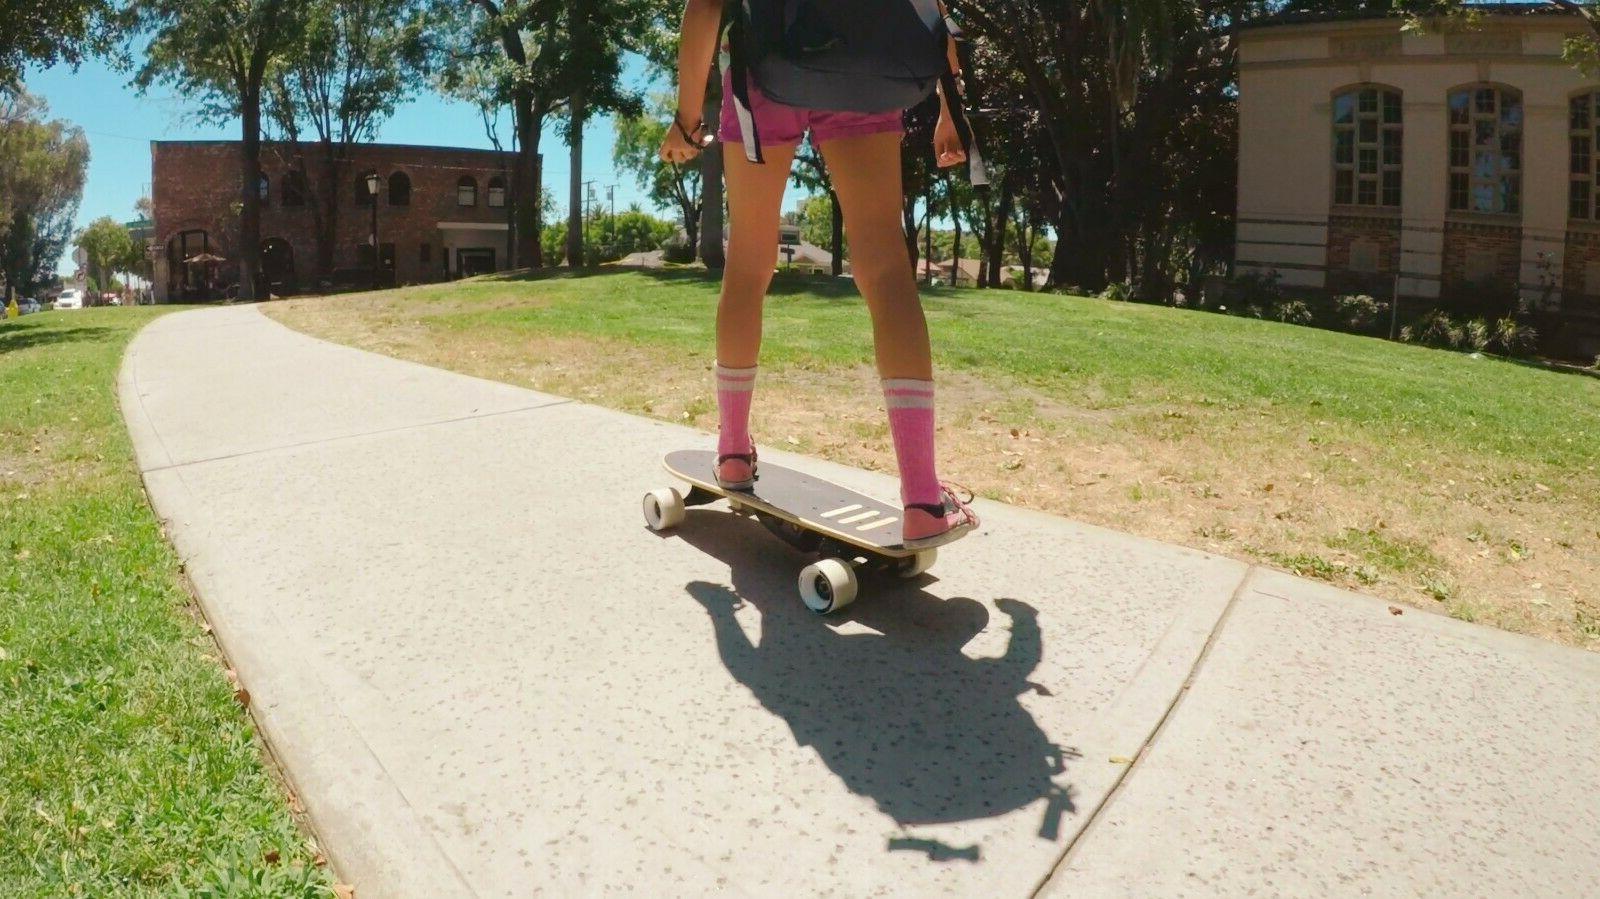 Razor Electric Skateboard Cruiser Wireless Remote Wrist Strap Speed Control